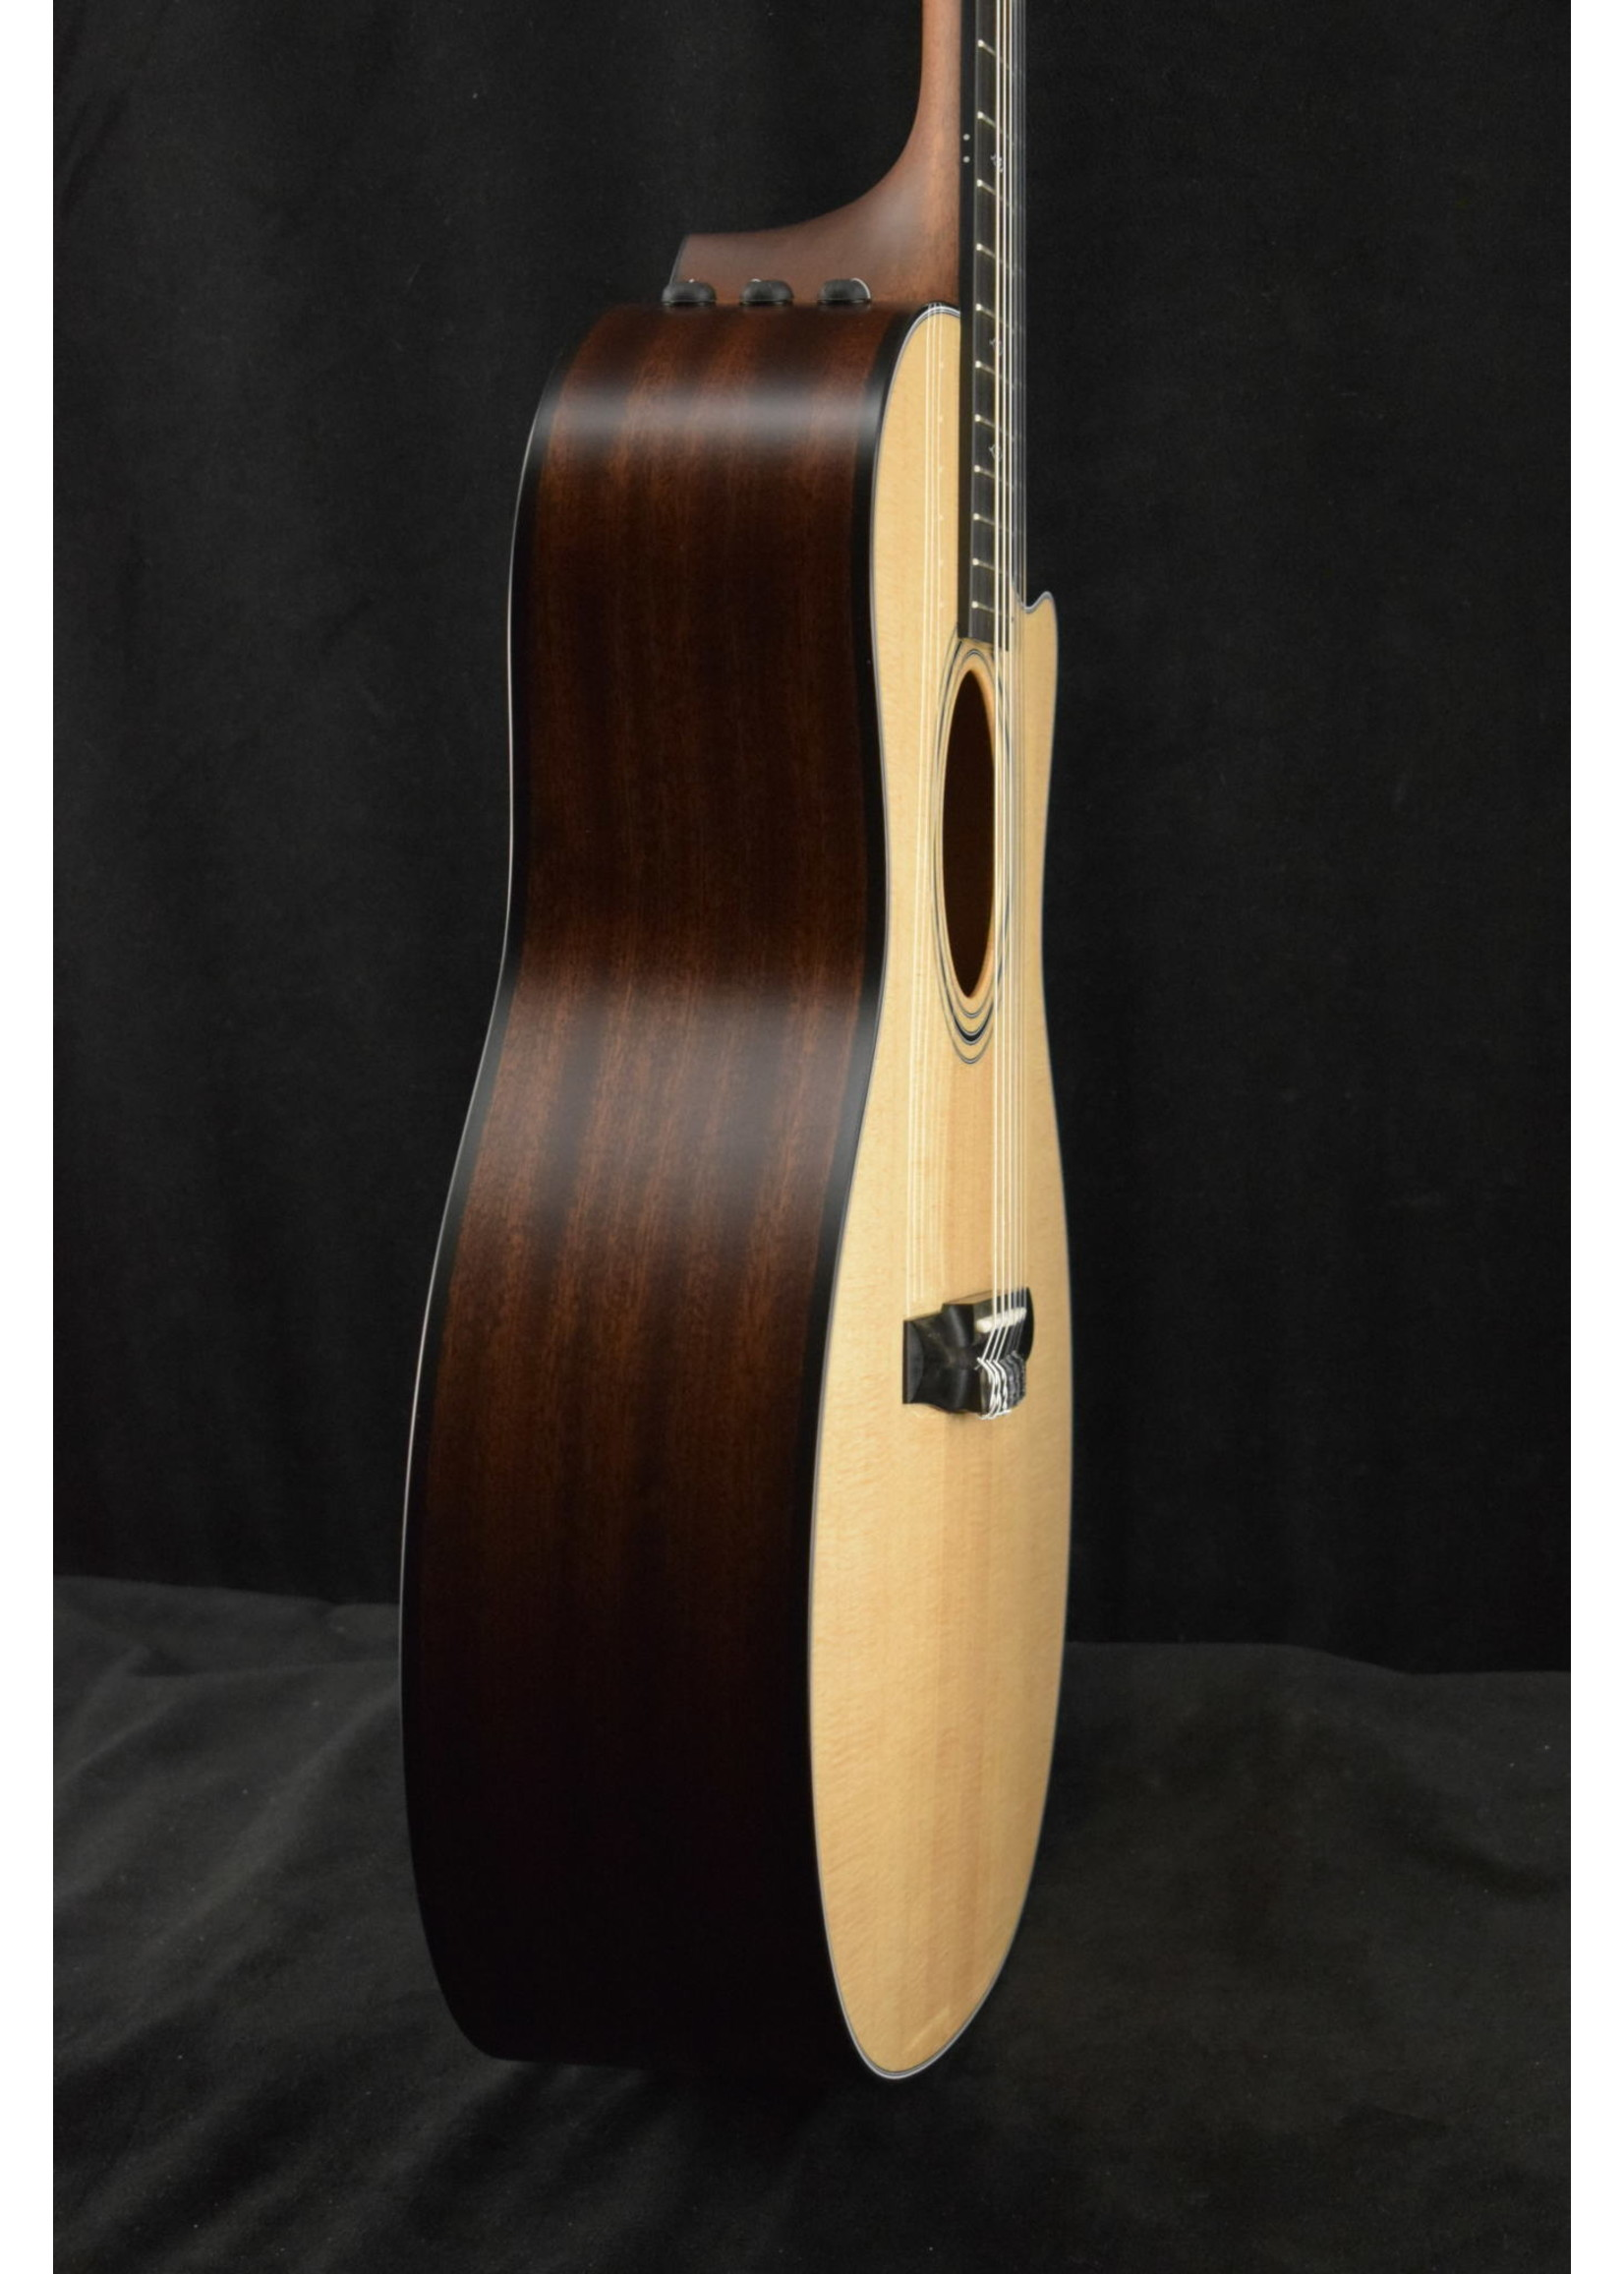 Taylor Taylor 314ce-N Nylon-String